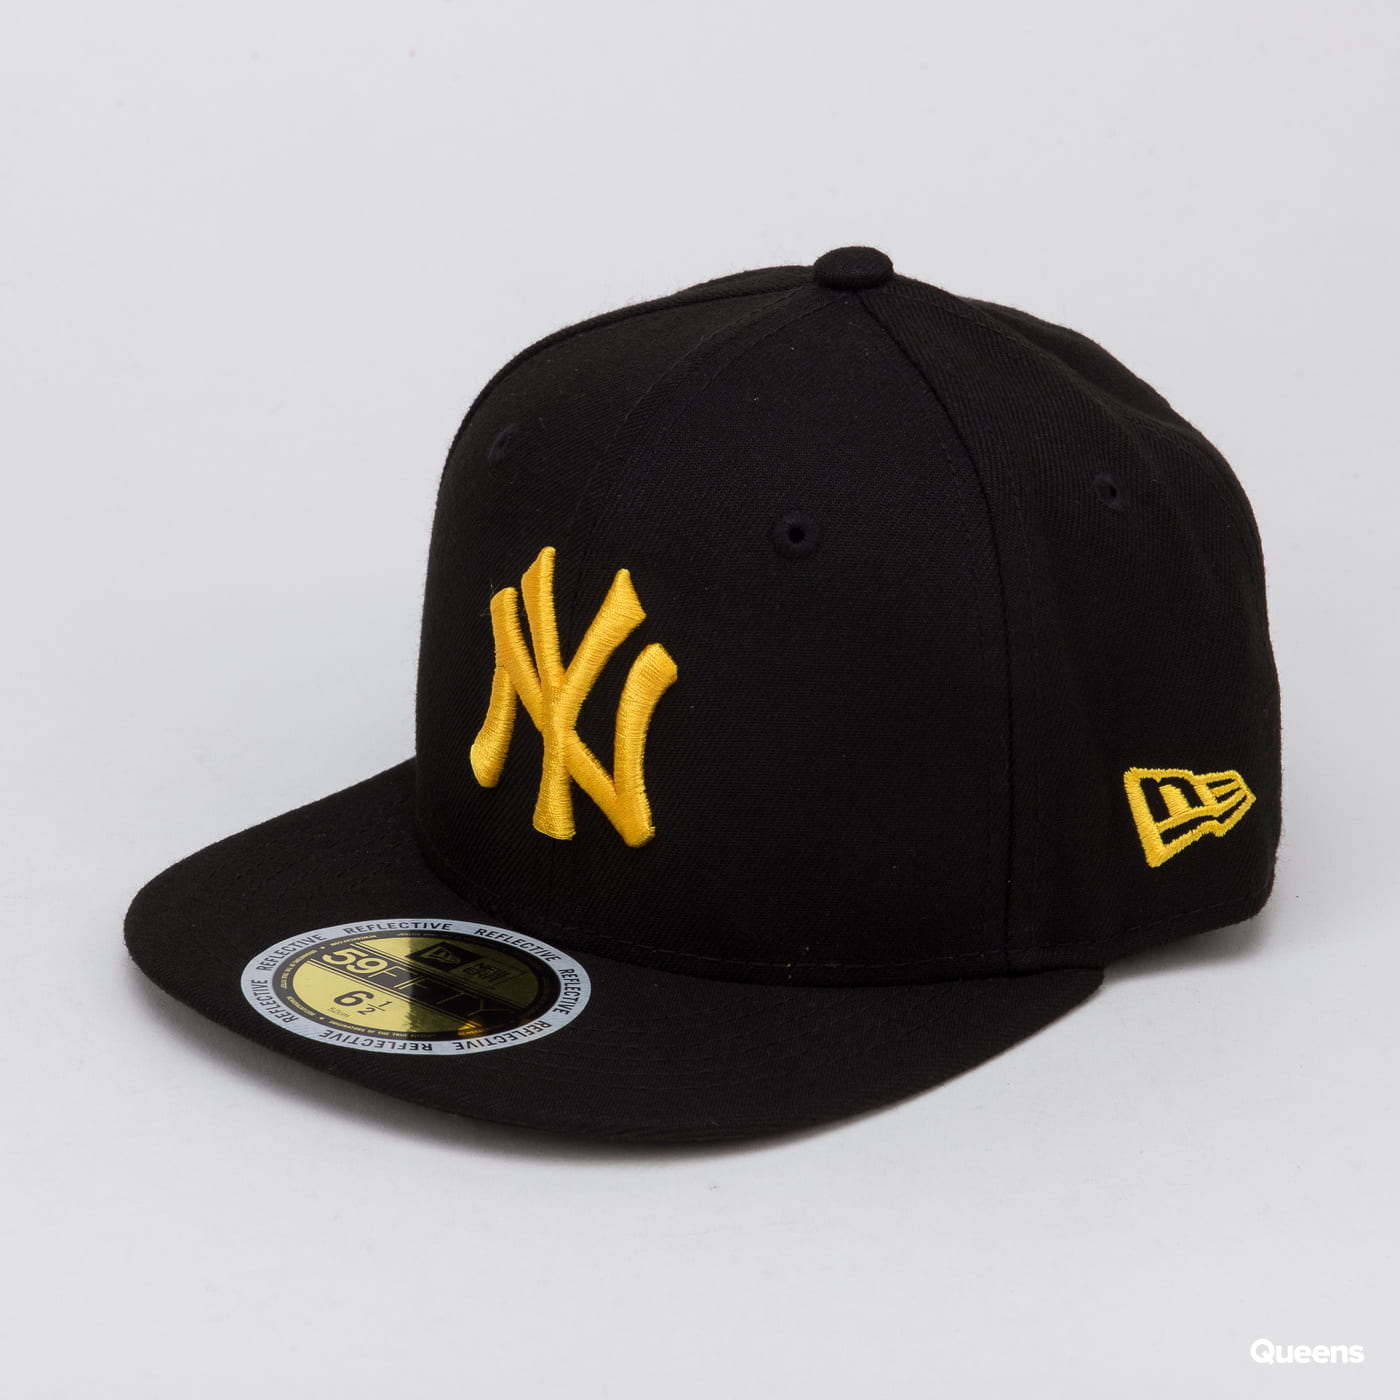 New Era 5950K MLB League Essential NY black